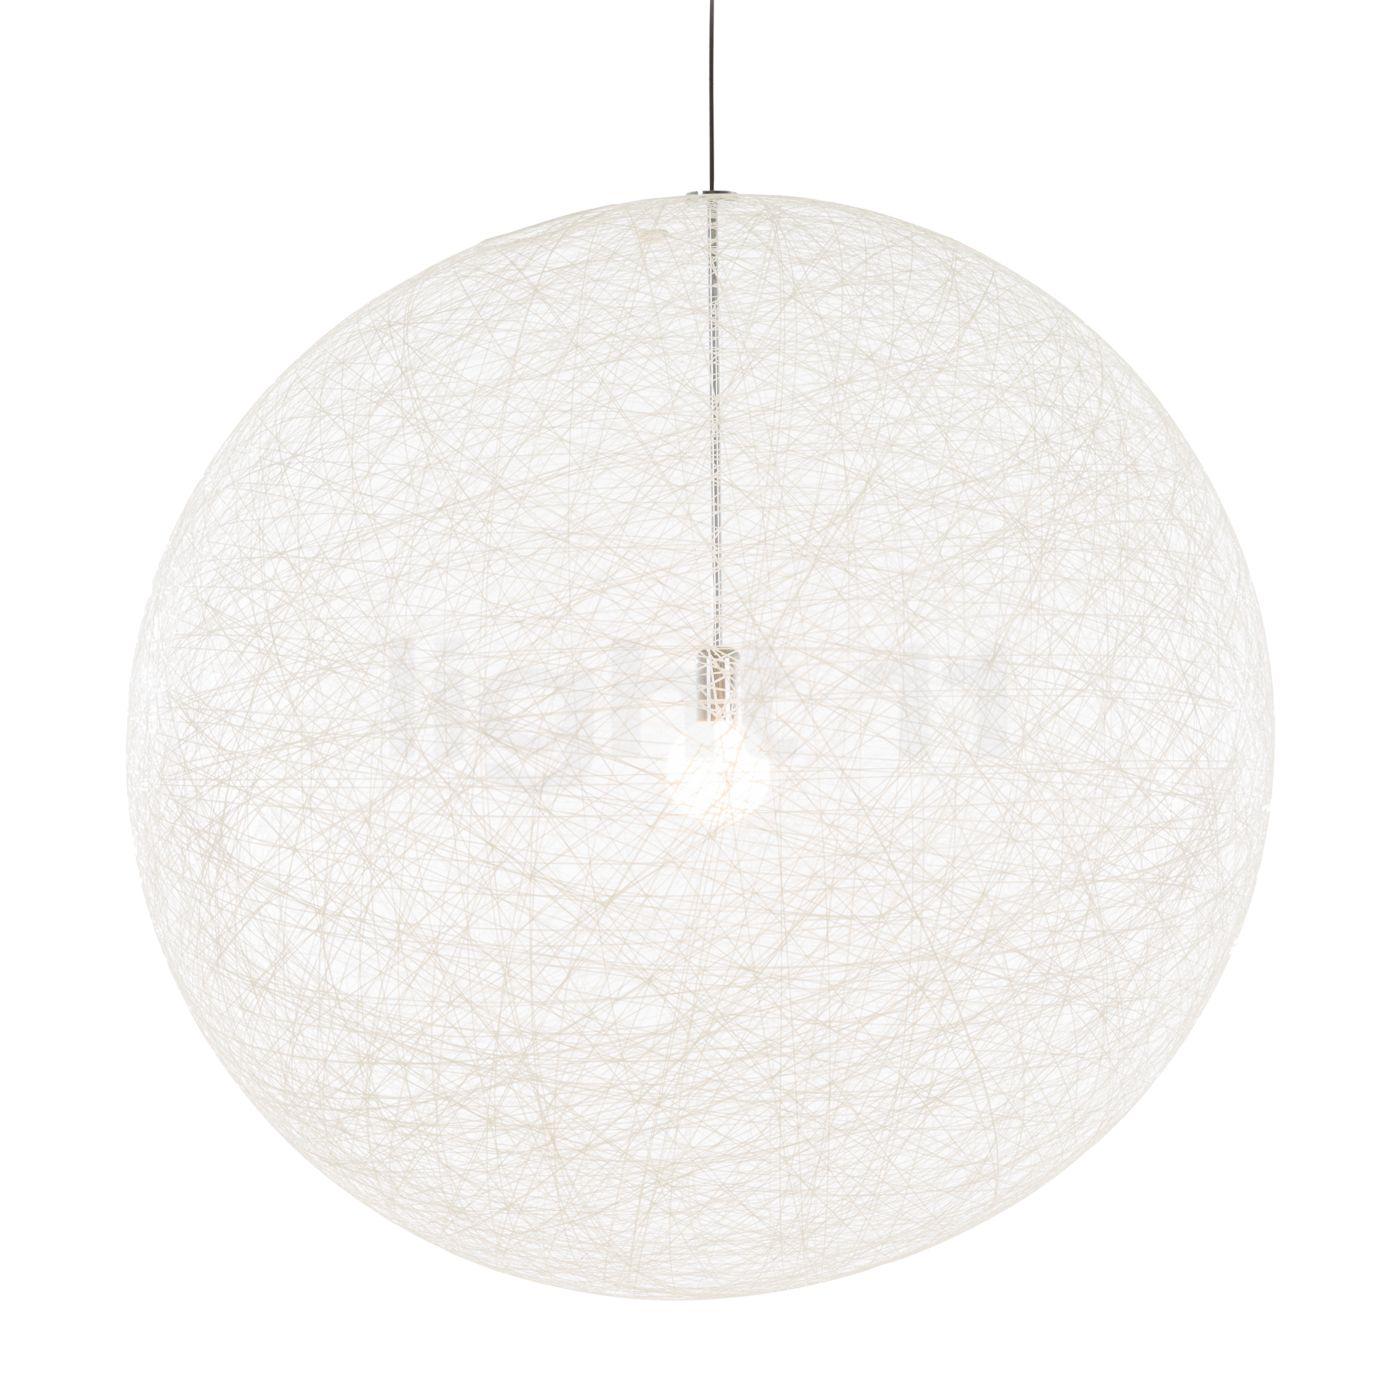 moooi random light pendelleuchte kaufen bei. Black Bedroom Furniture Sets. Home Design Ideas